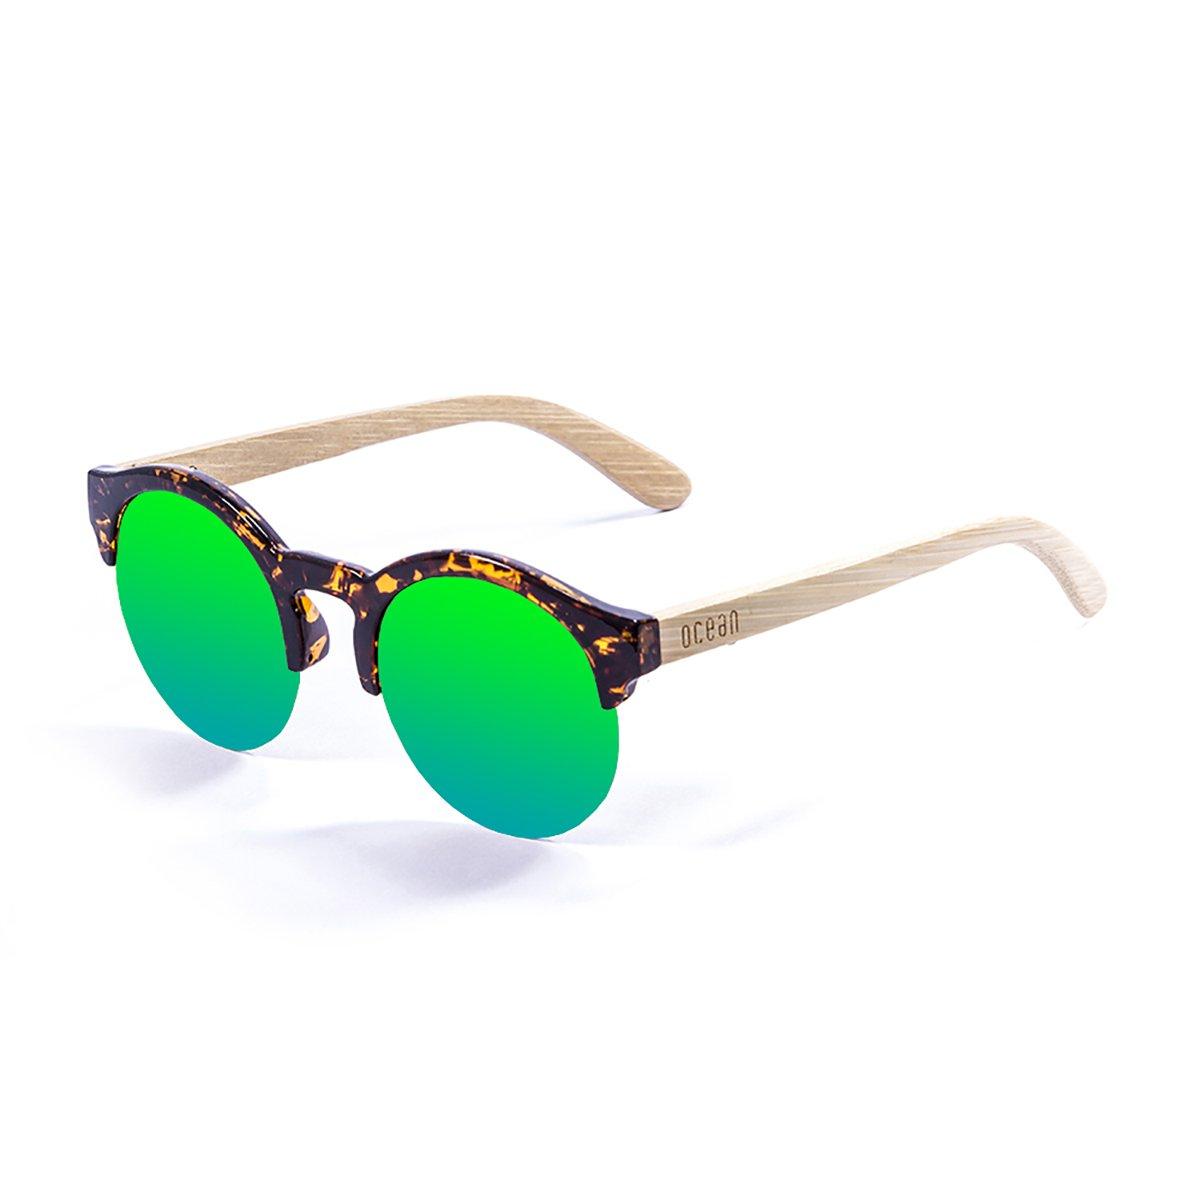 Ocean Sunglasses Sotavento Lunettes de Soleil Mixte Adulte, Demy Brown Frame/Wood Natural Arms/Revo Green Lens